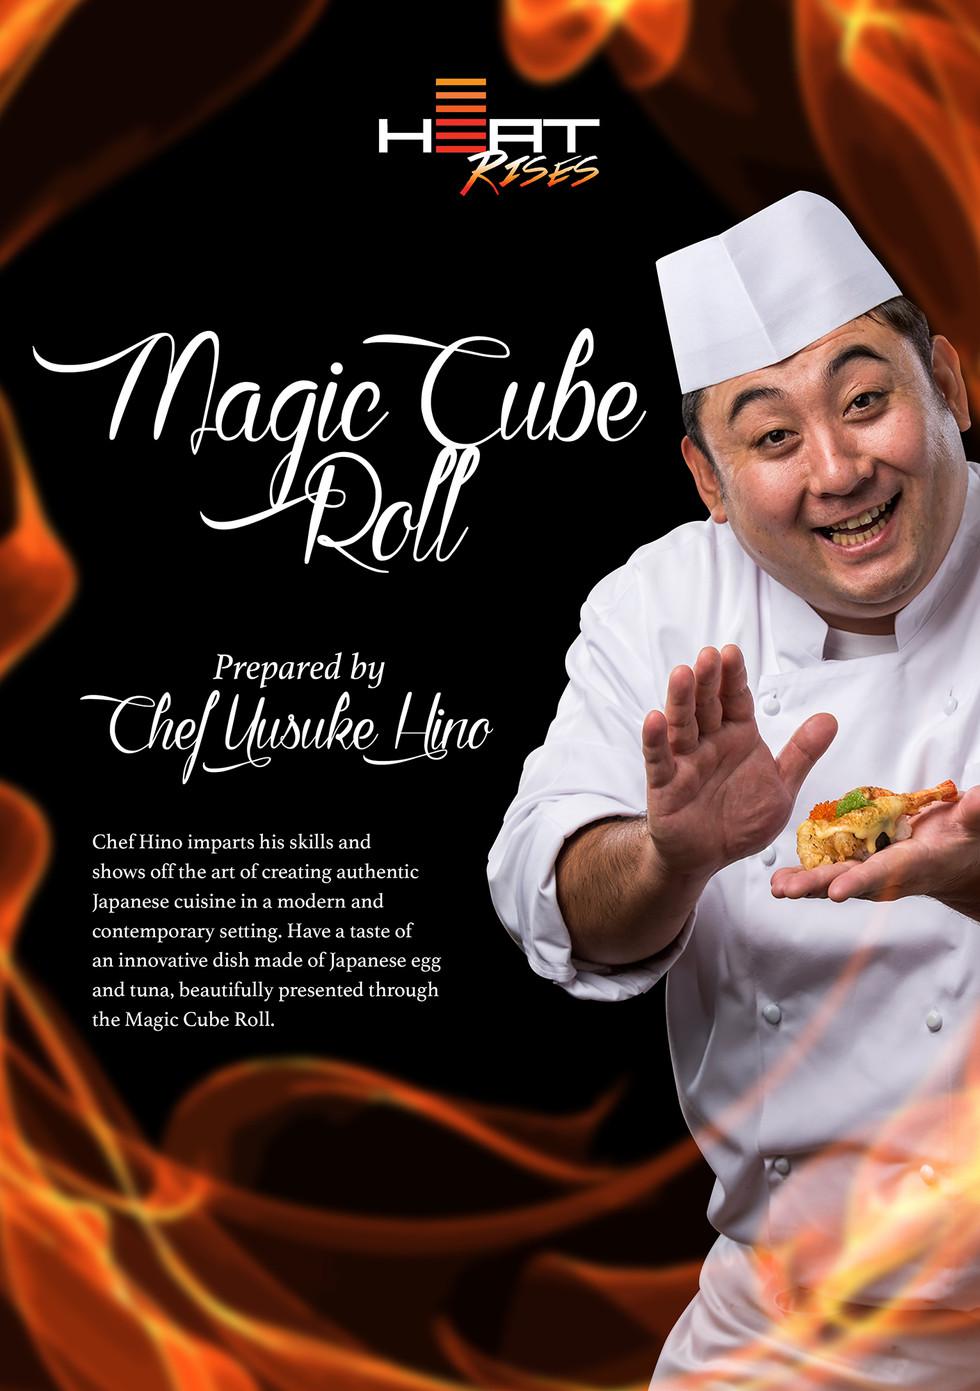 Magic Cube Roll - Yusuke Hino.jpg